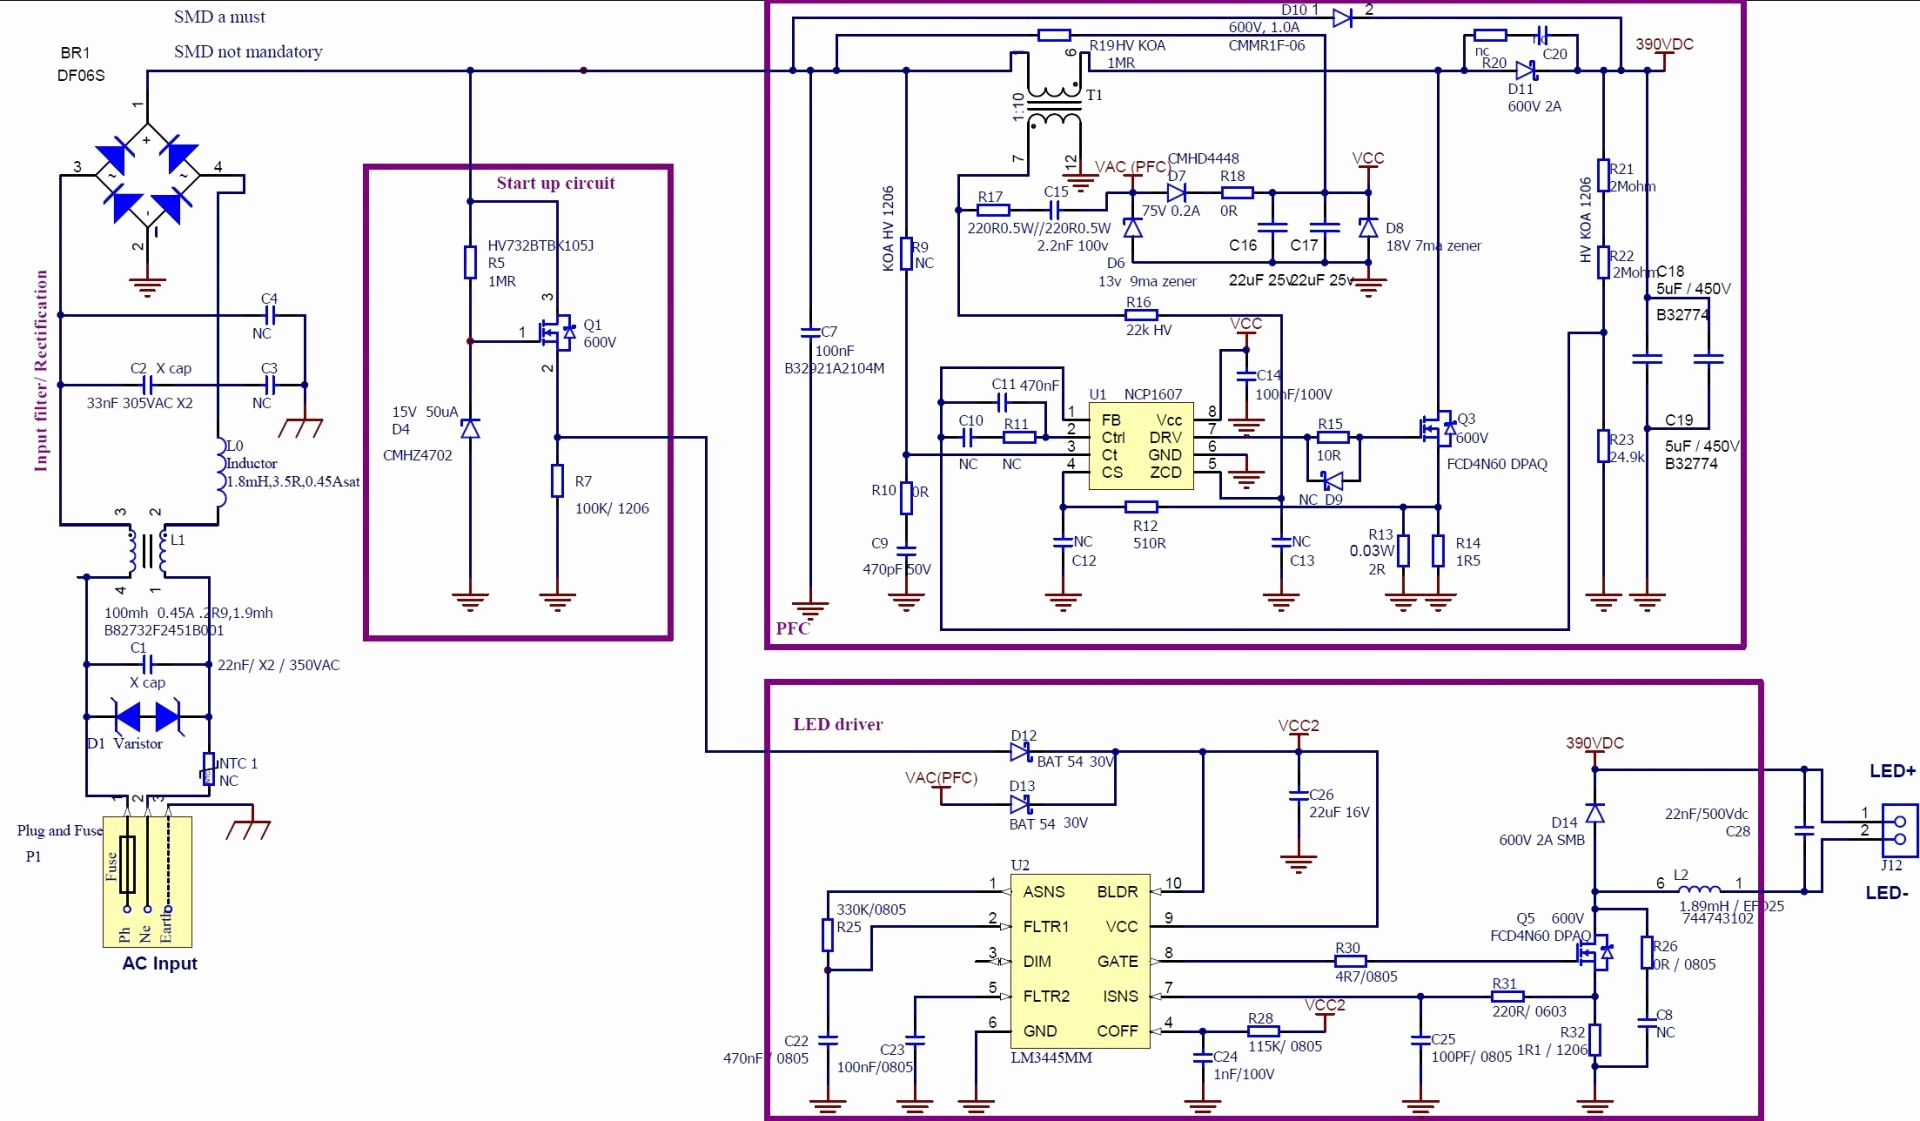 Lithonia T8 4 Bulb Wiring Diagram | Manual E-Books - 2 Lamp T8 Ballast Wiring Diagram